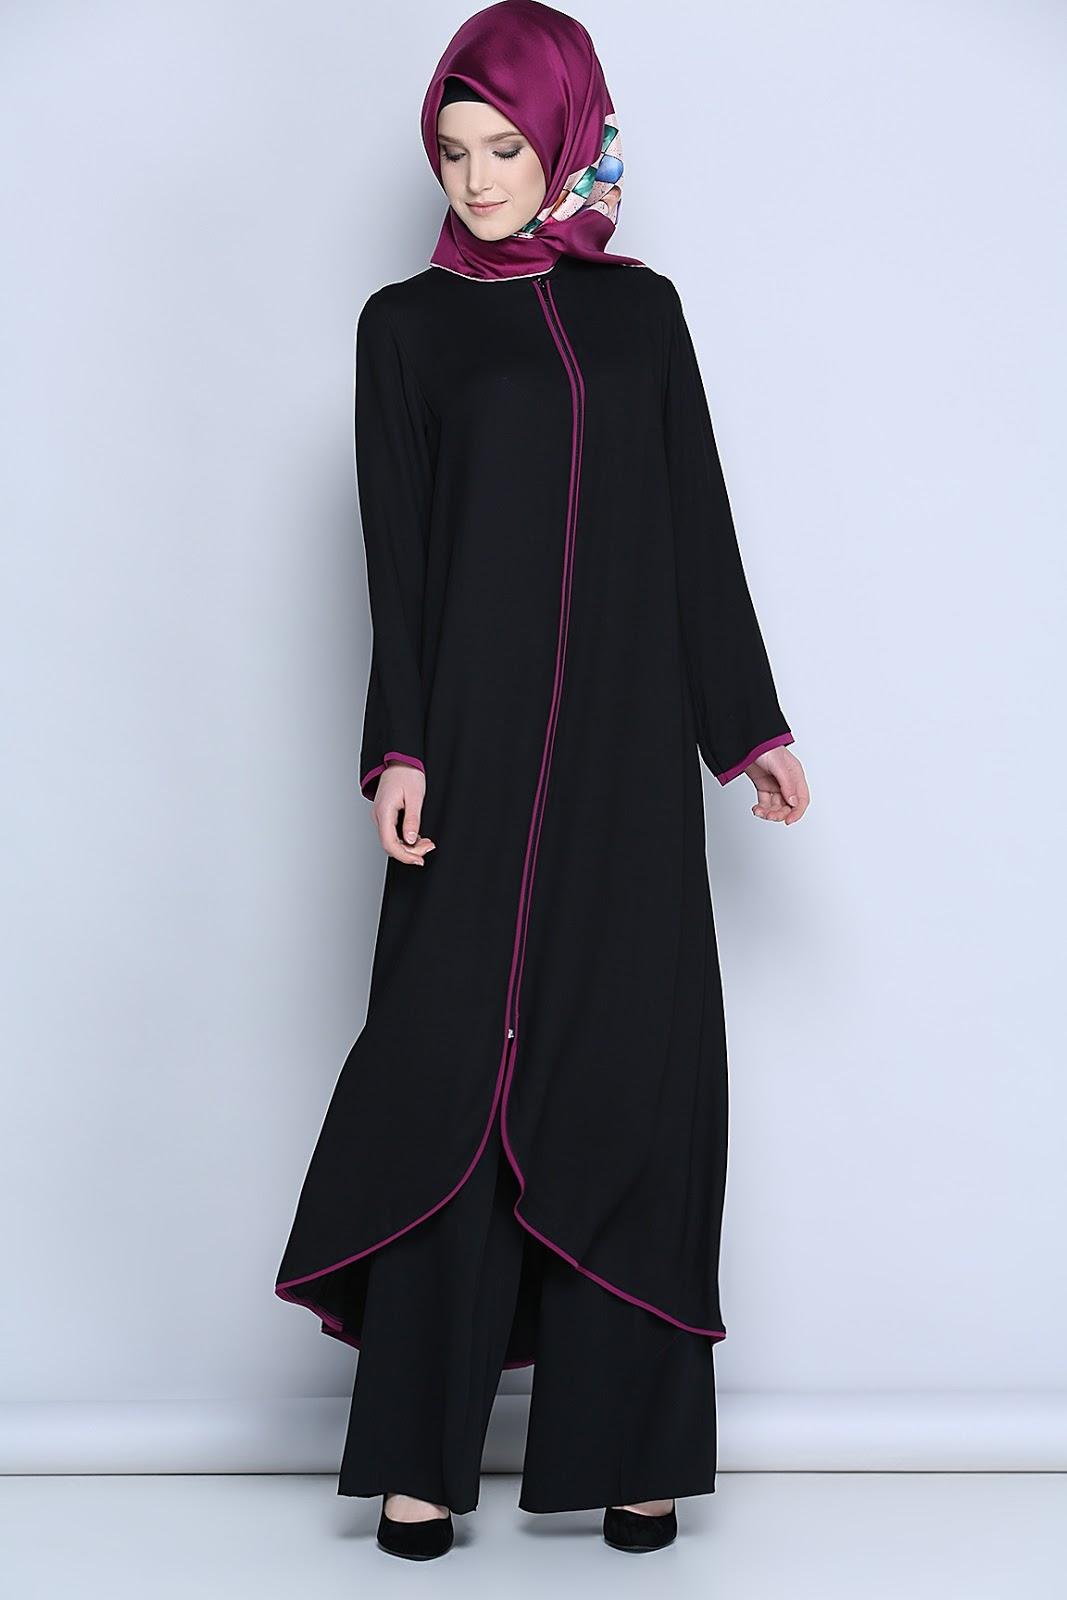 v tement hijab islamique et moderne t 2018 hijab fashion and chic style. Black Bedroom Furniture Sets. Home Design Ideas